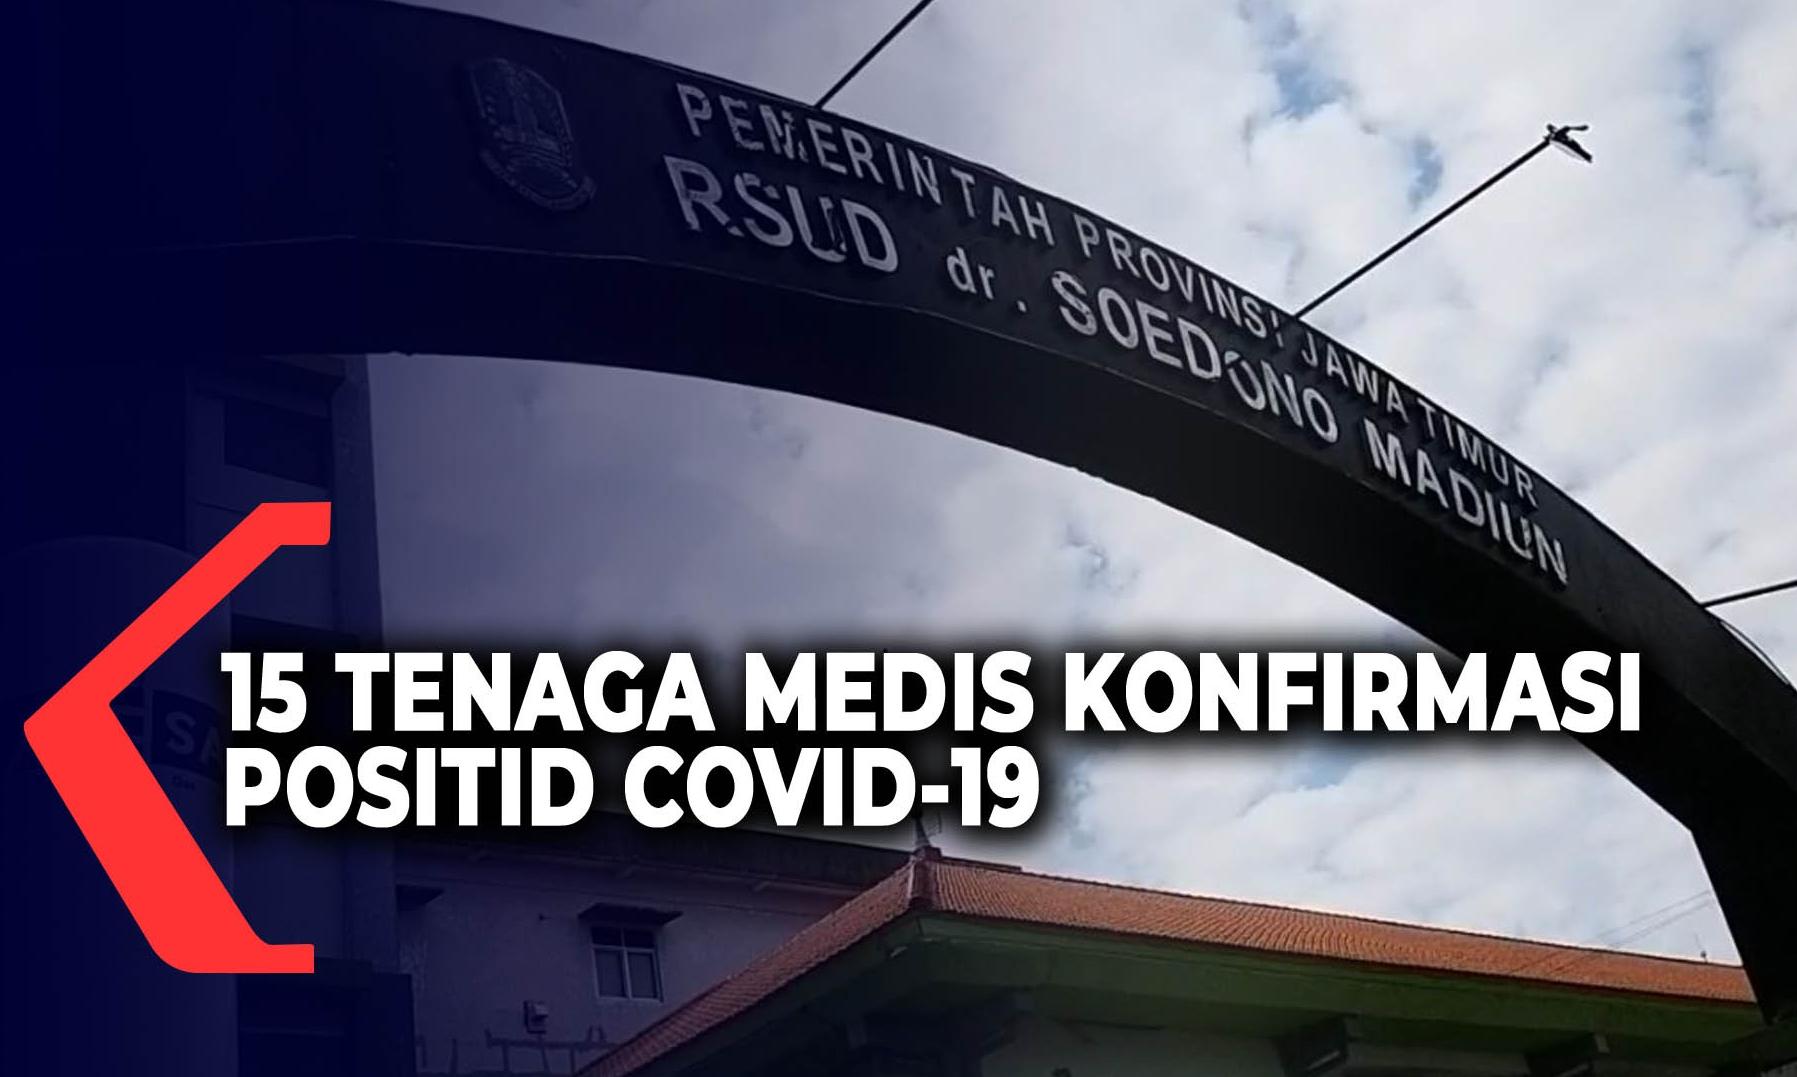 15-tenaga-medis-rsud-soedono-madiun-terkonfirmasi-covid-19